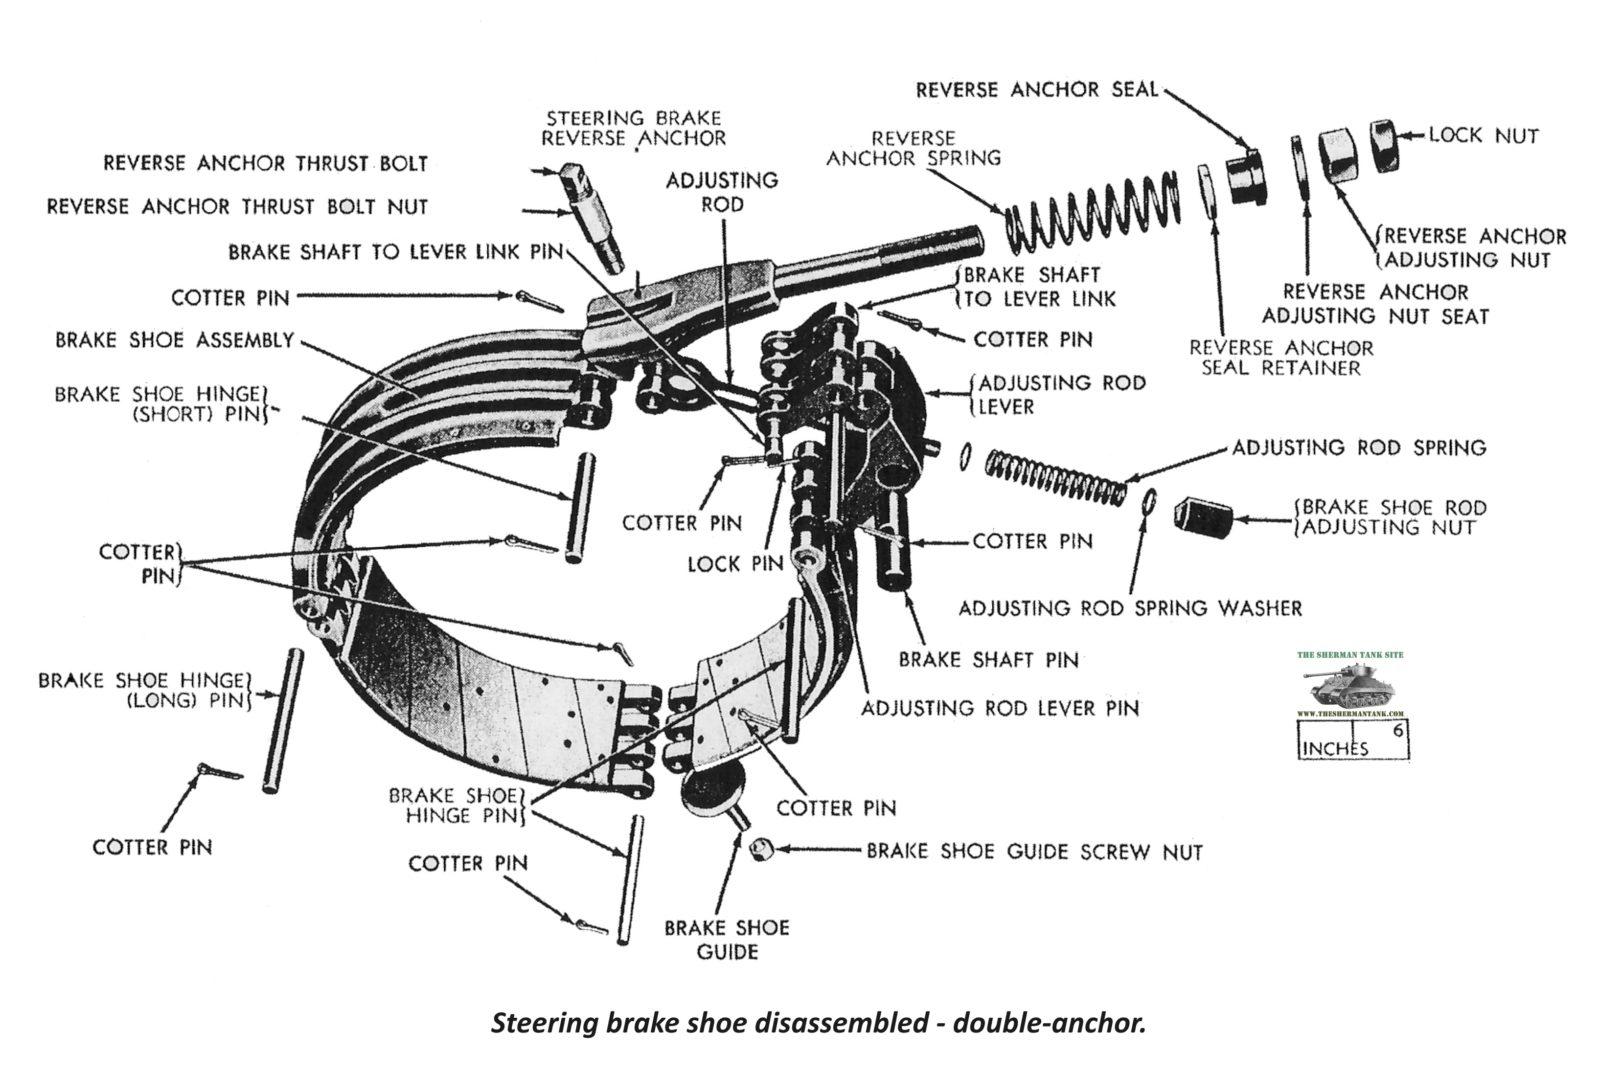 F252-Steering-brake-shoe-disassembled-do